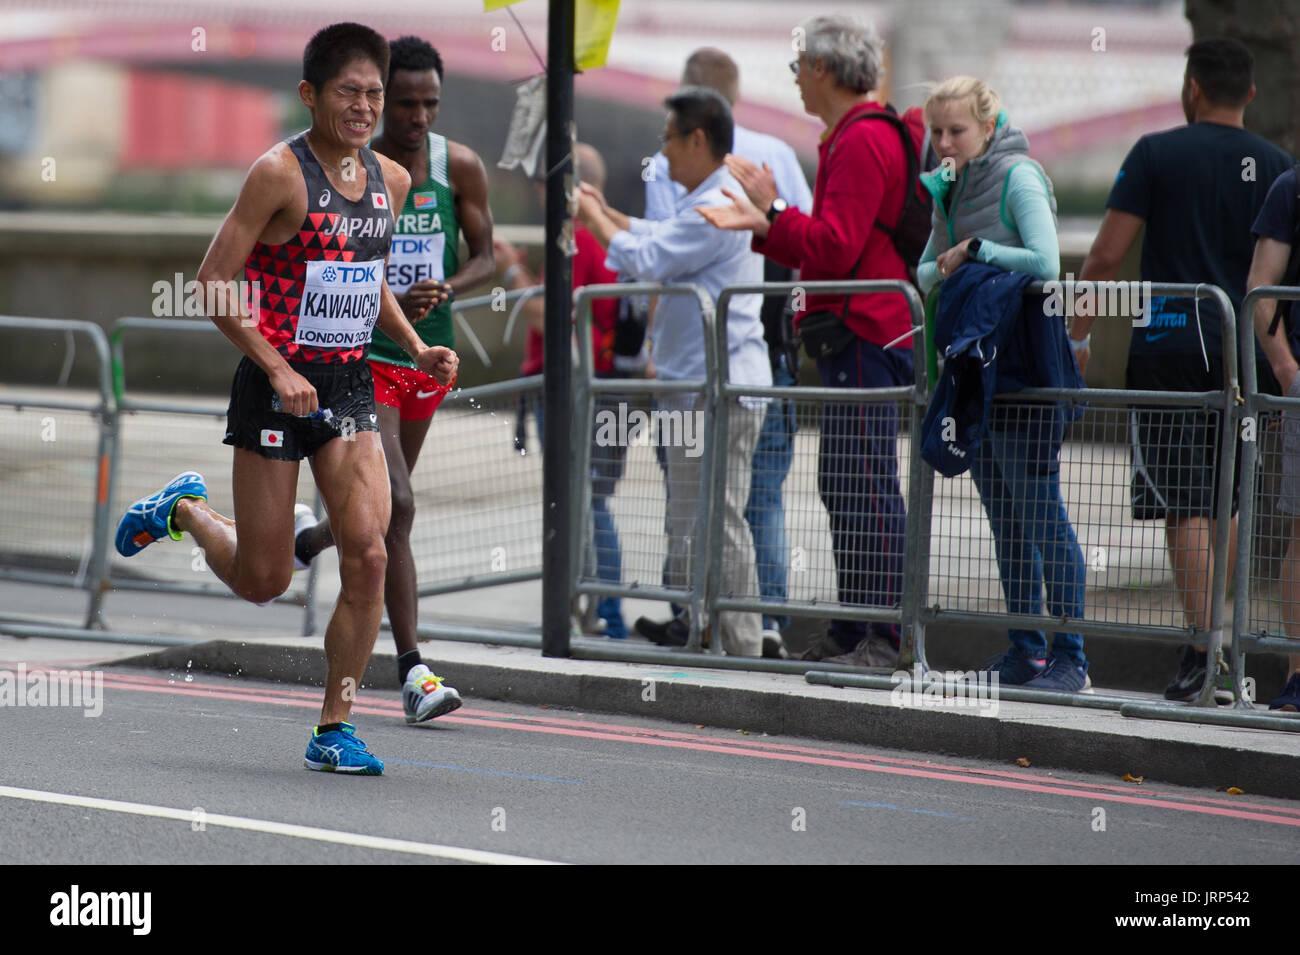 London, UK. 6th August, 2017. Yuki Kawauchi (Japan) leads Amanuel Mesel (Eritrea) at the IAAF World Athletics Championships Men's Marathon Race Credit: Phil Swallow Photography/Alamy Live News - Stock Image